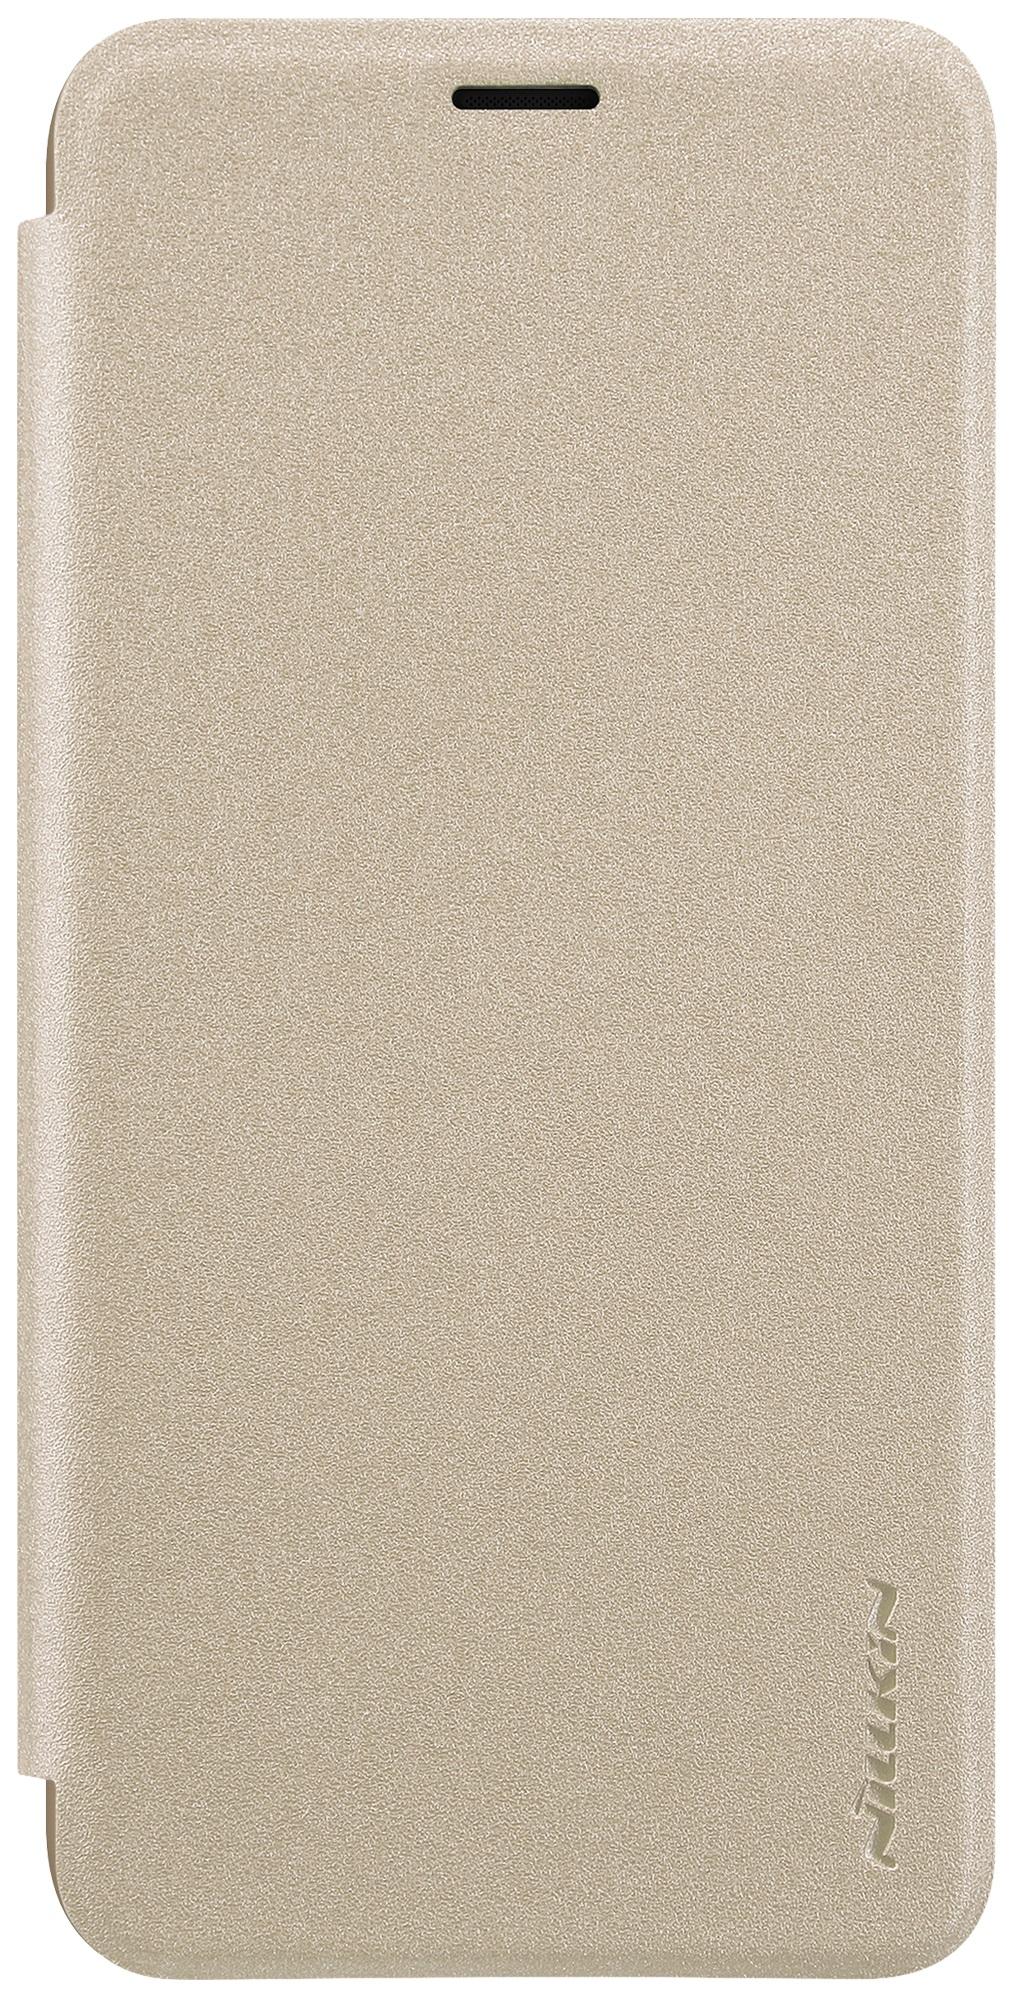 Чехол для сотового телефона Nillkin T-N-HH7X-009, золотой чехол nillkin sparkle leather case для apple iphone 6 plus цвет белый t n aiphone6p 009